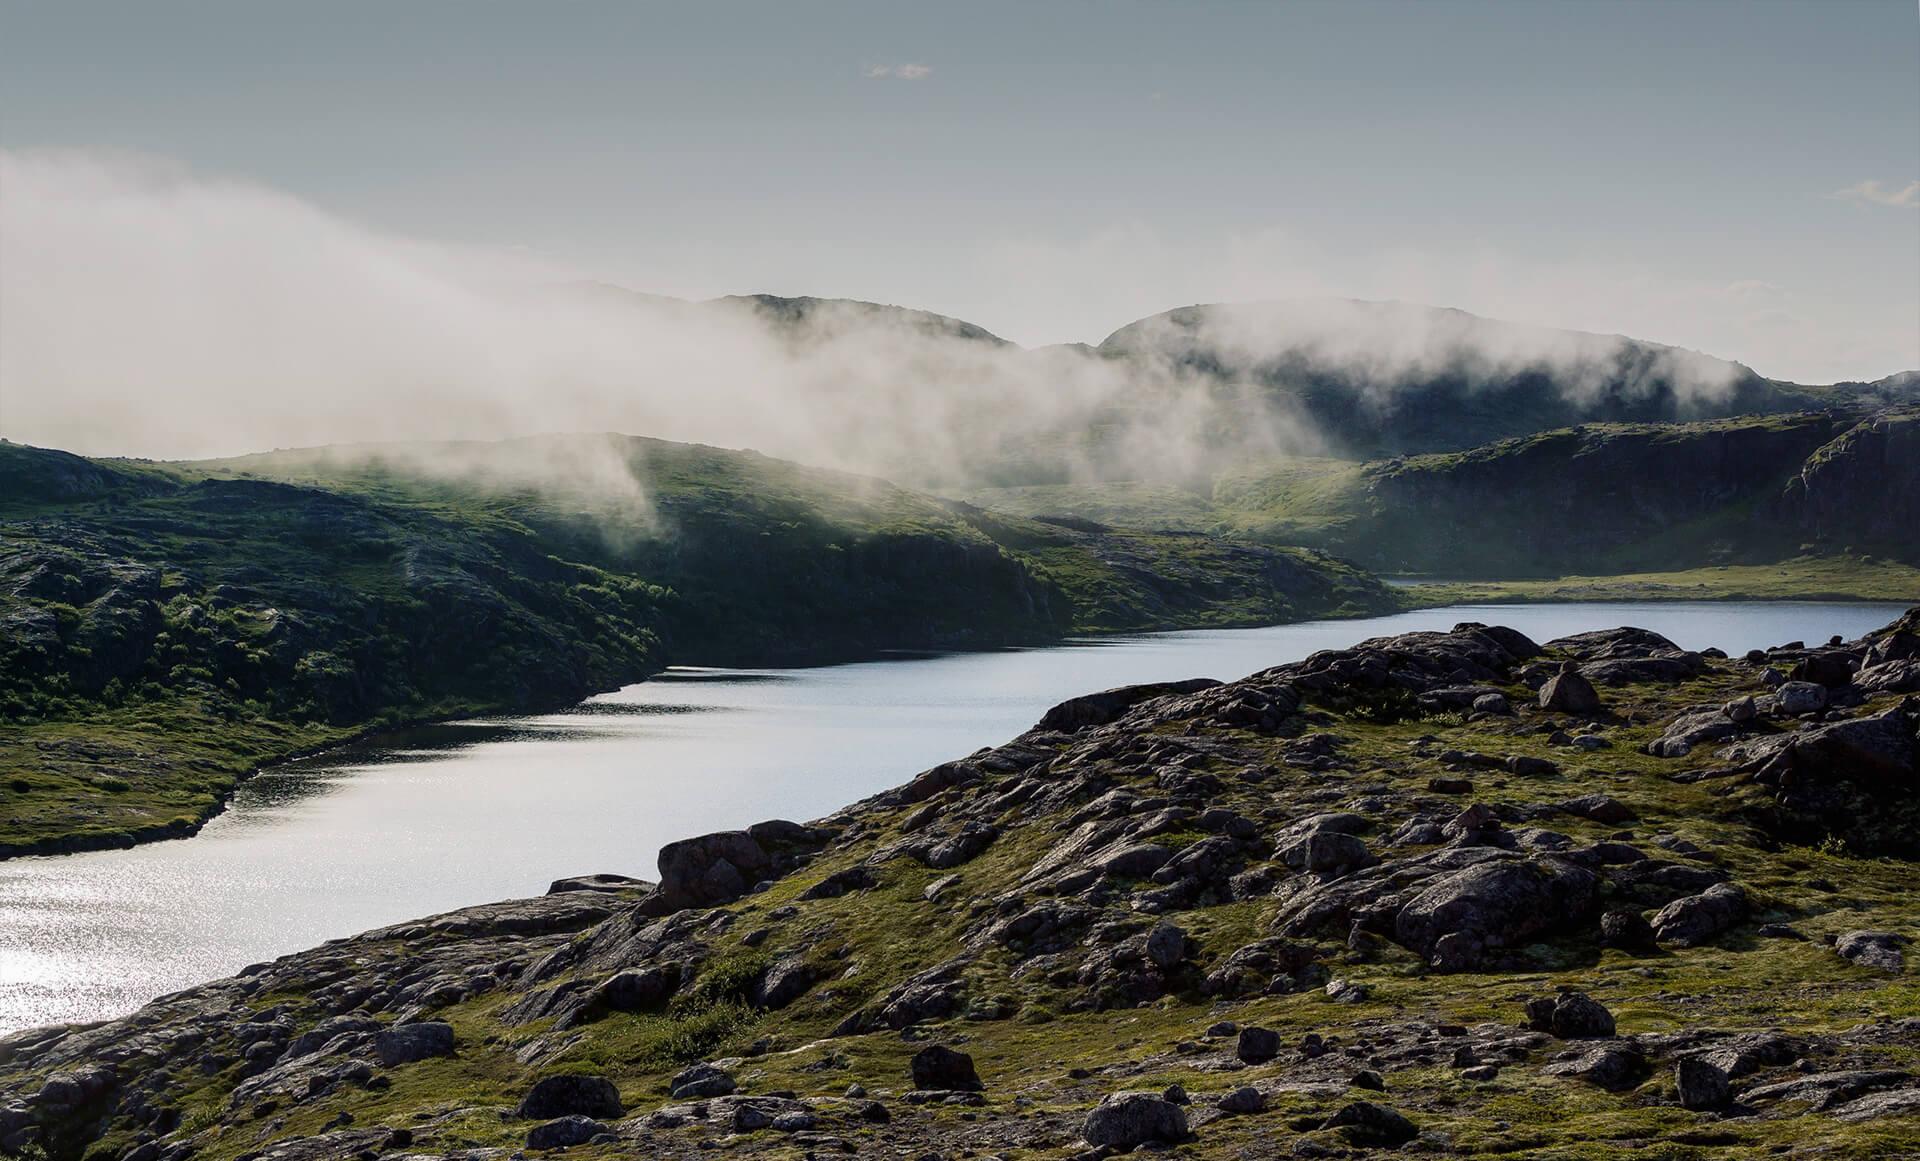 agence kayak communication web lille nord fleuve nature